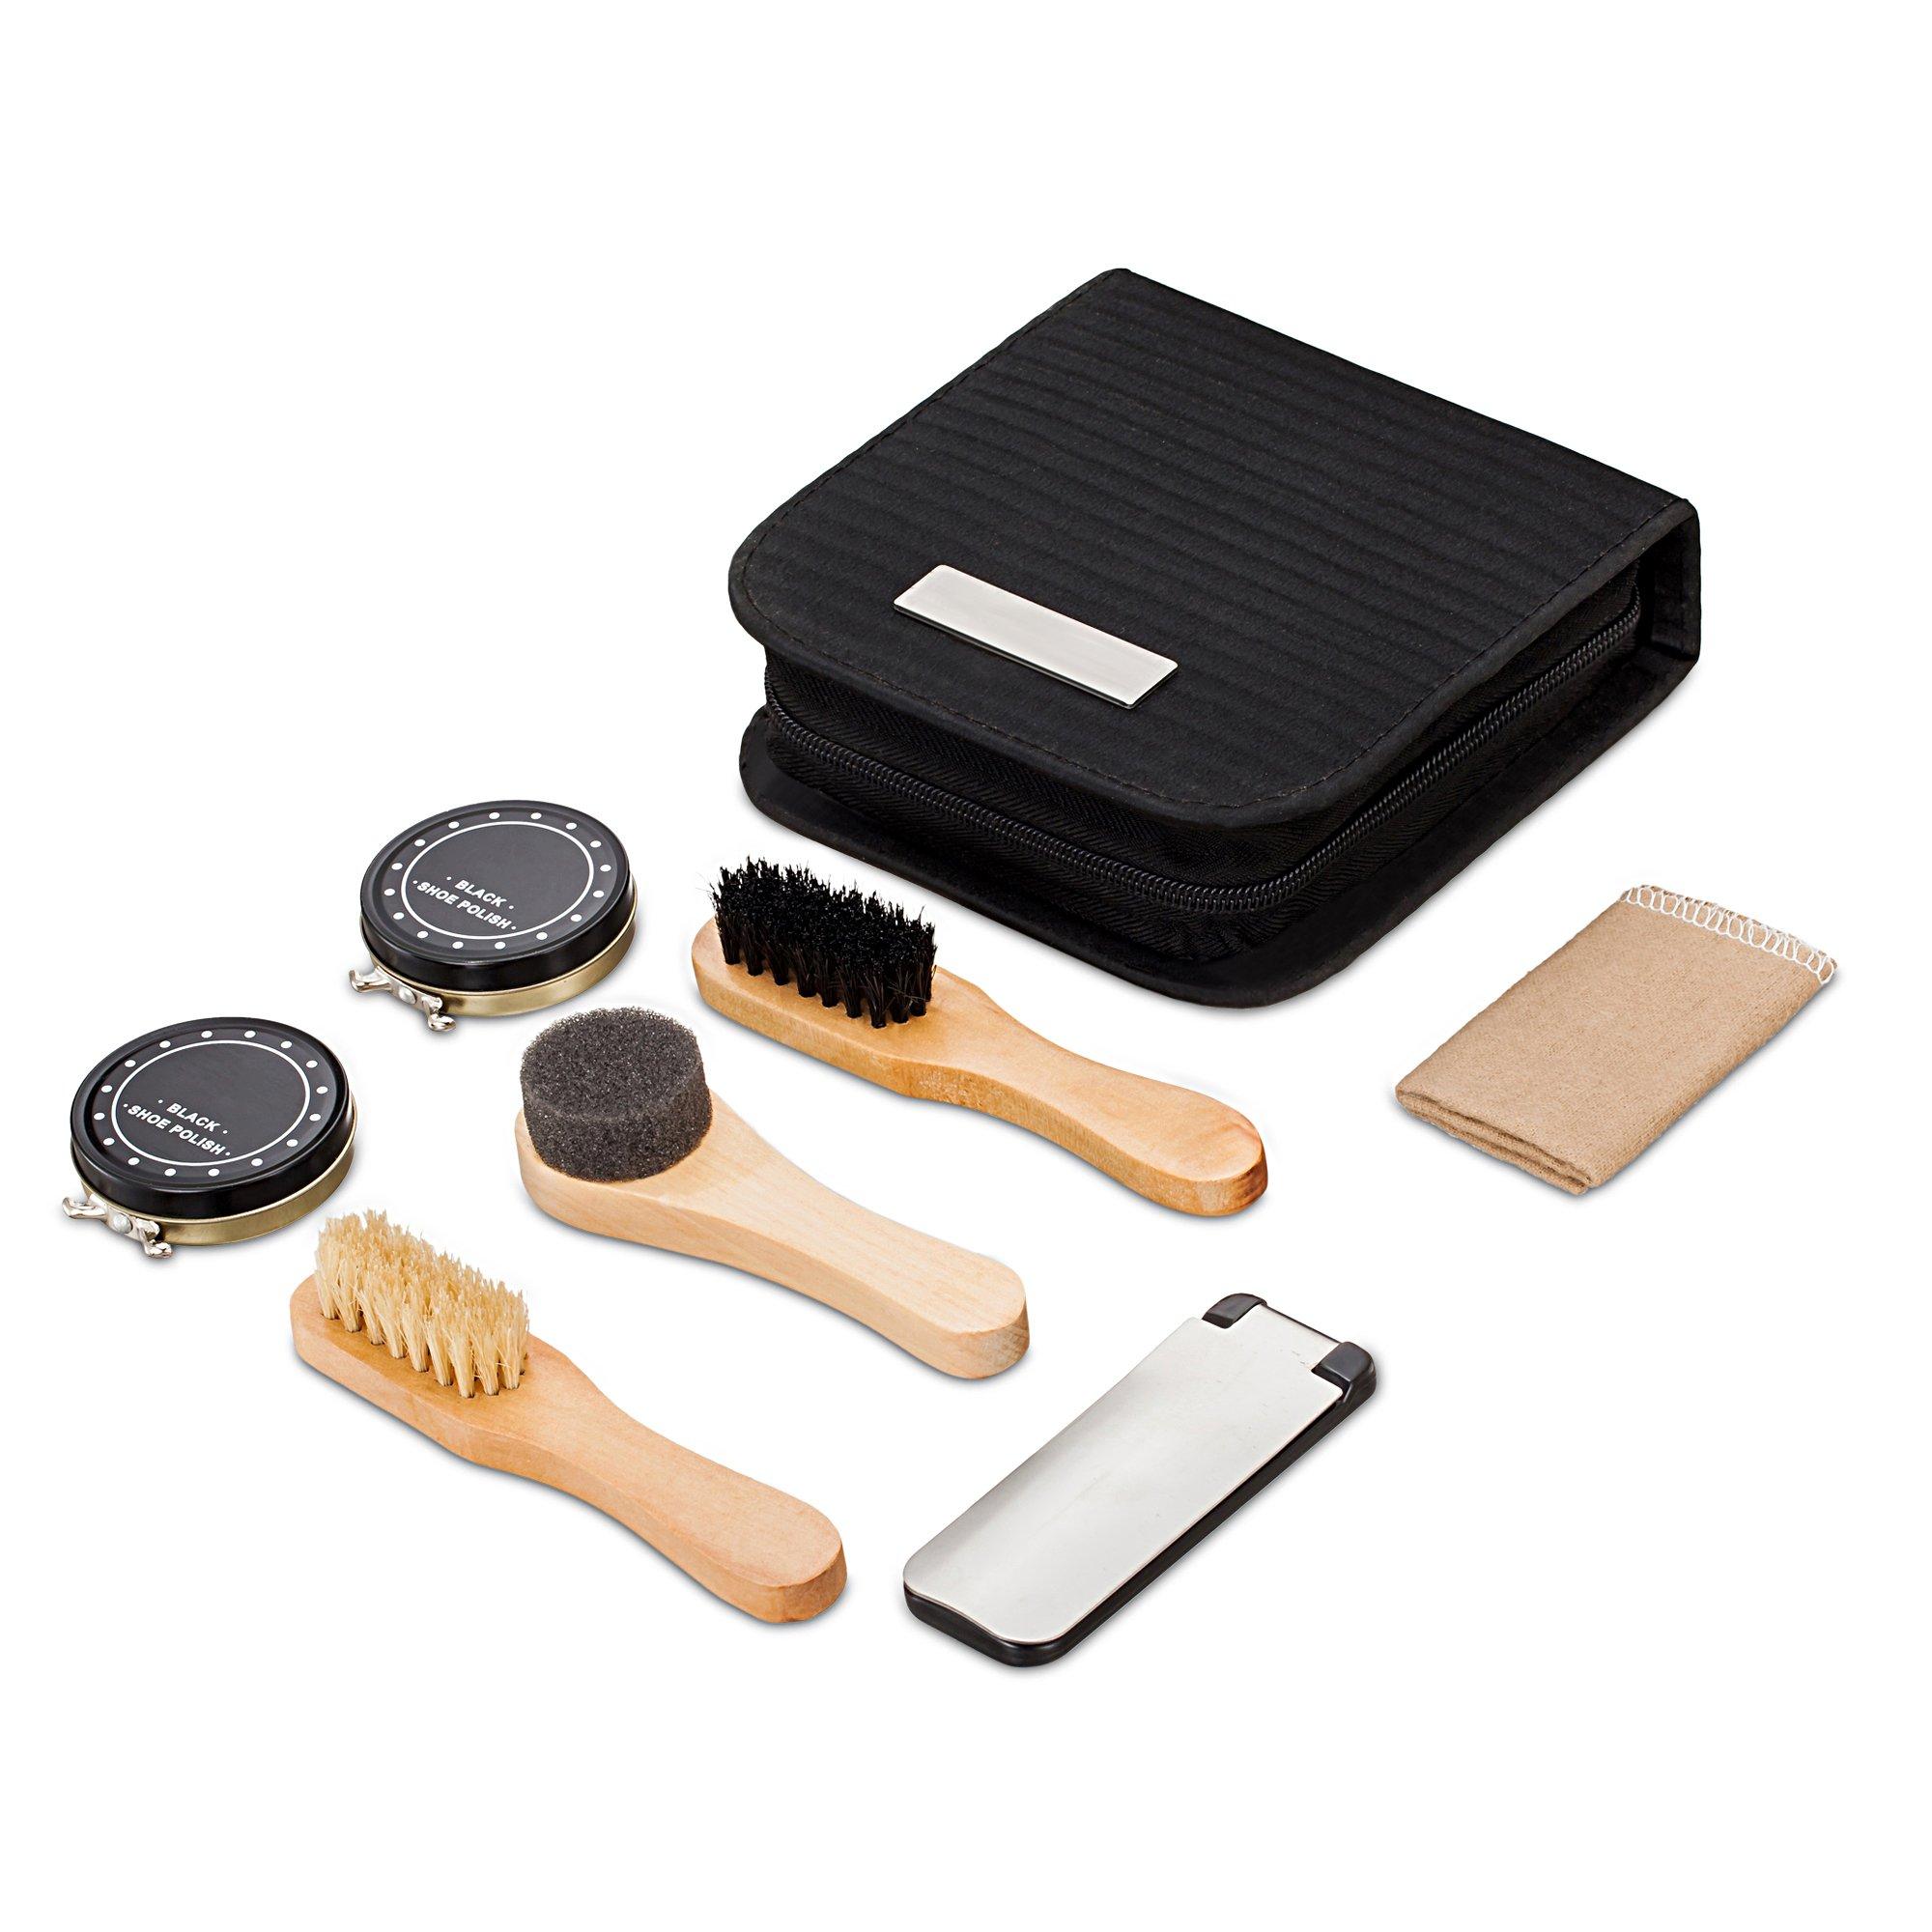 feffaa2d650 Get Quotations · Shoe Shine Kit   Shoe Care Valet with PU Leather Sleek  Elegant Case